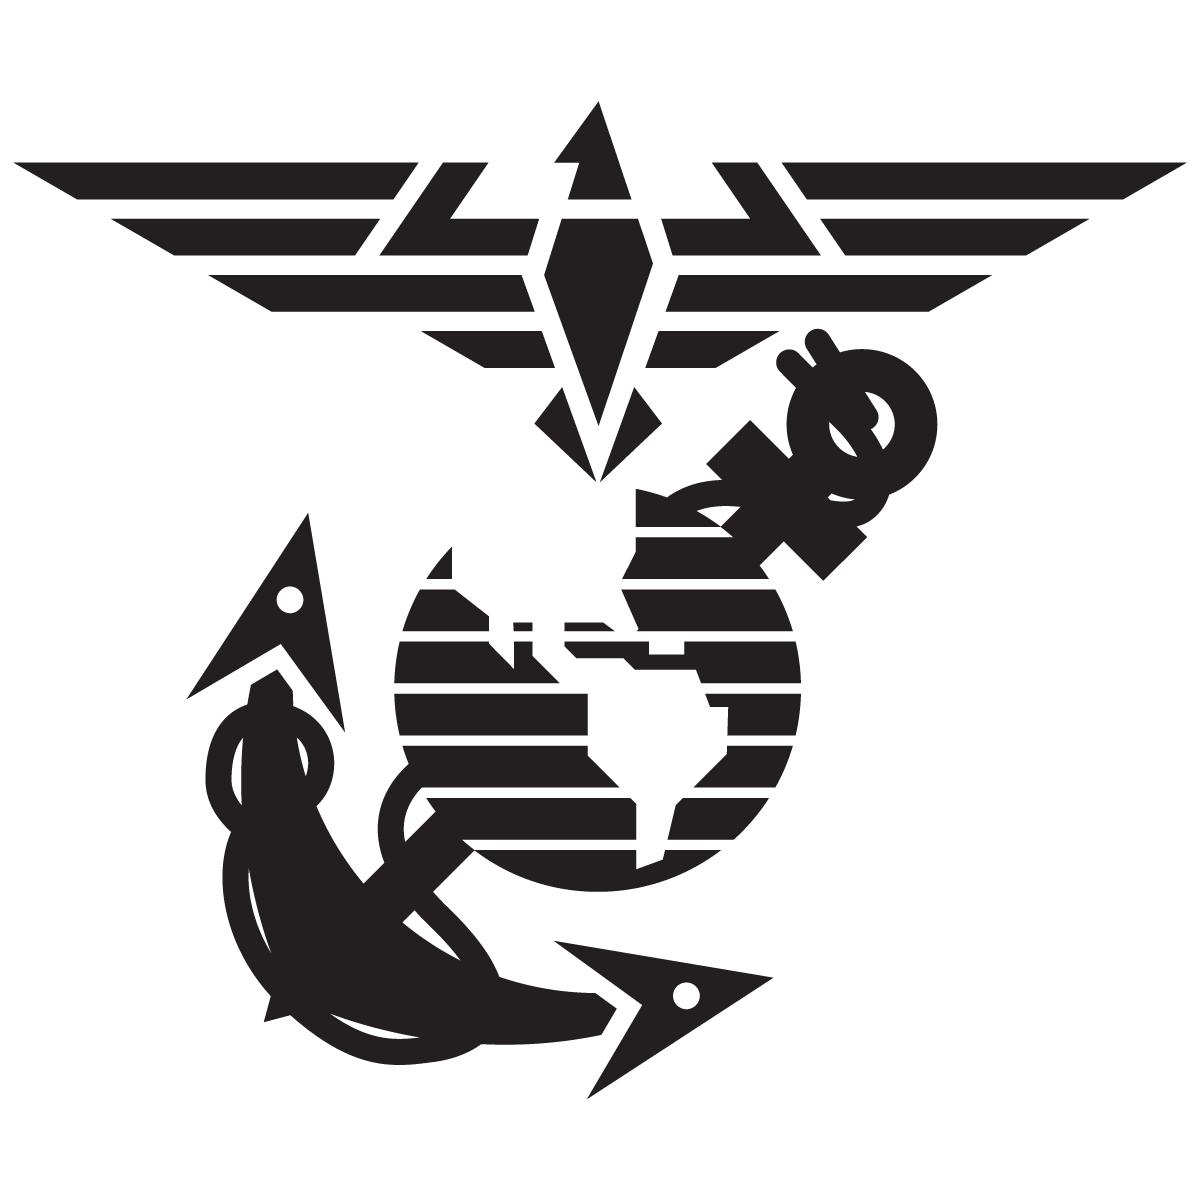 Eagle Globe And Anchor Emblem Contemporary Marine Corps